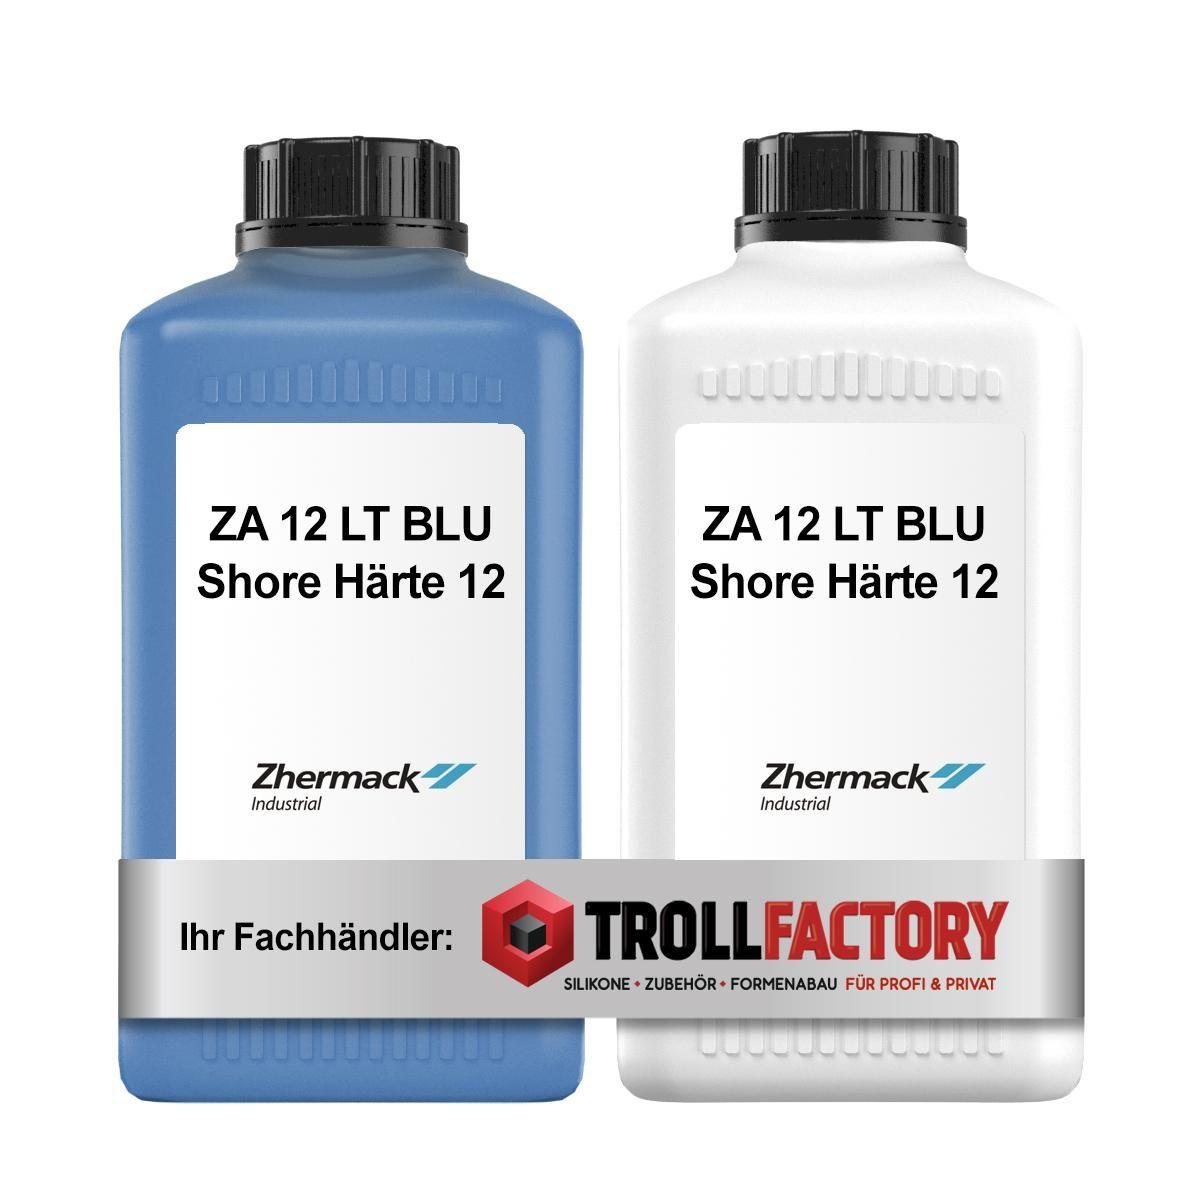 Zhermack Silikon Kautschuk ZA 12 LT BLU Shore Härte 12 - Größe: 2kg (2x1kg)